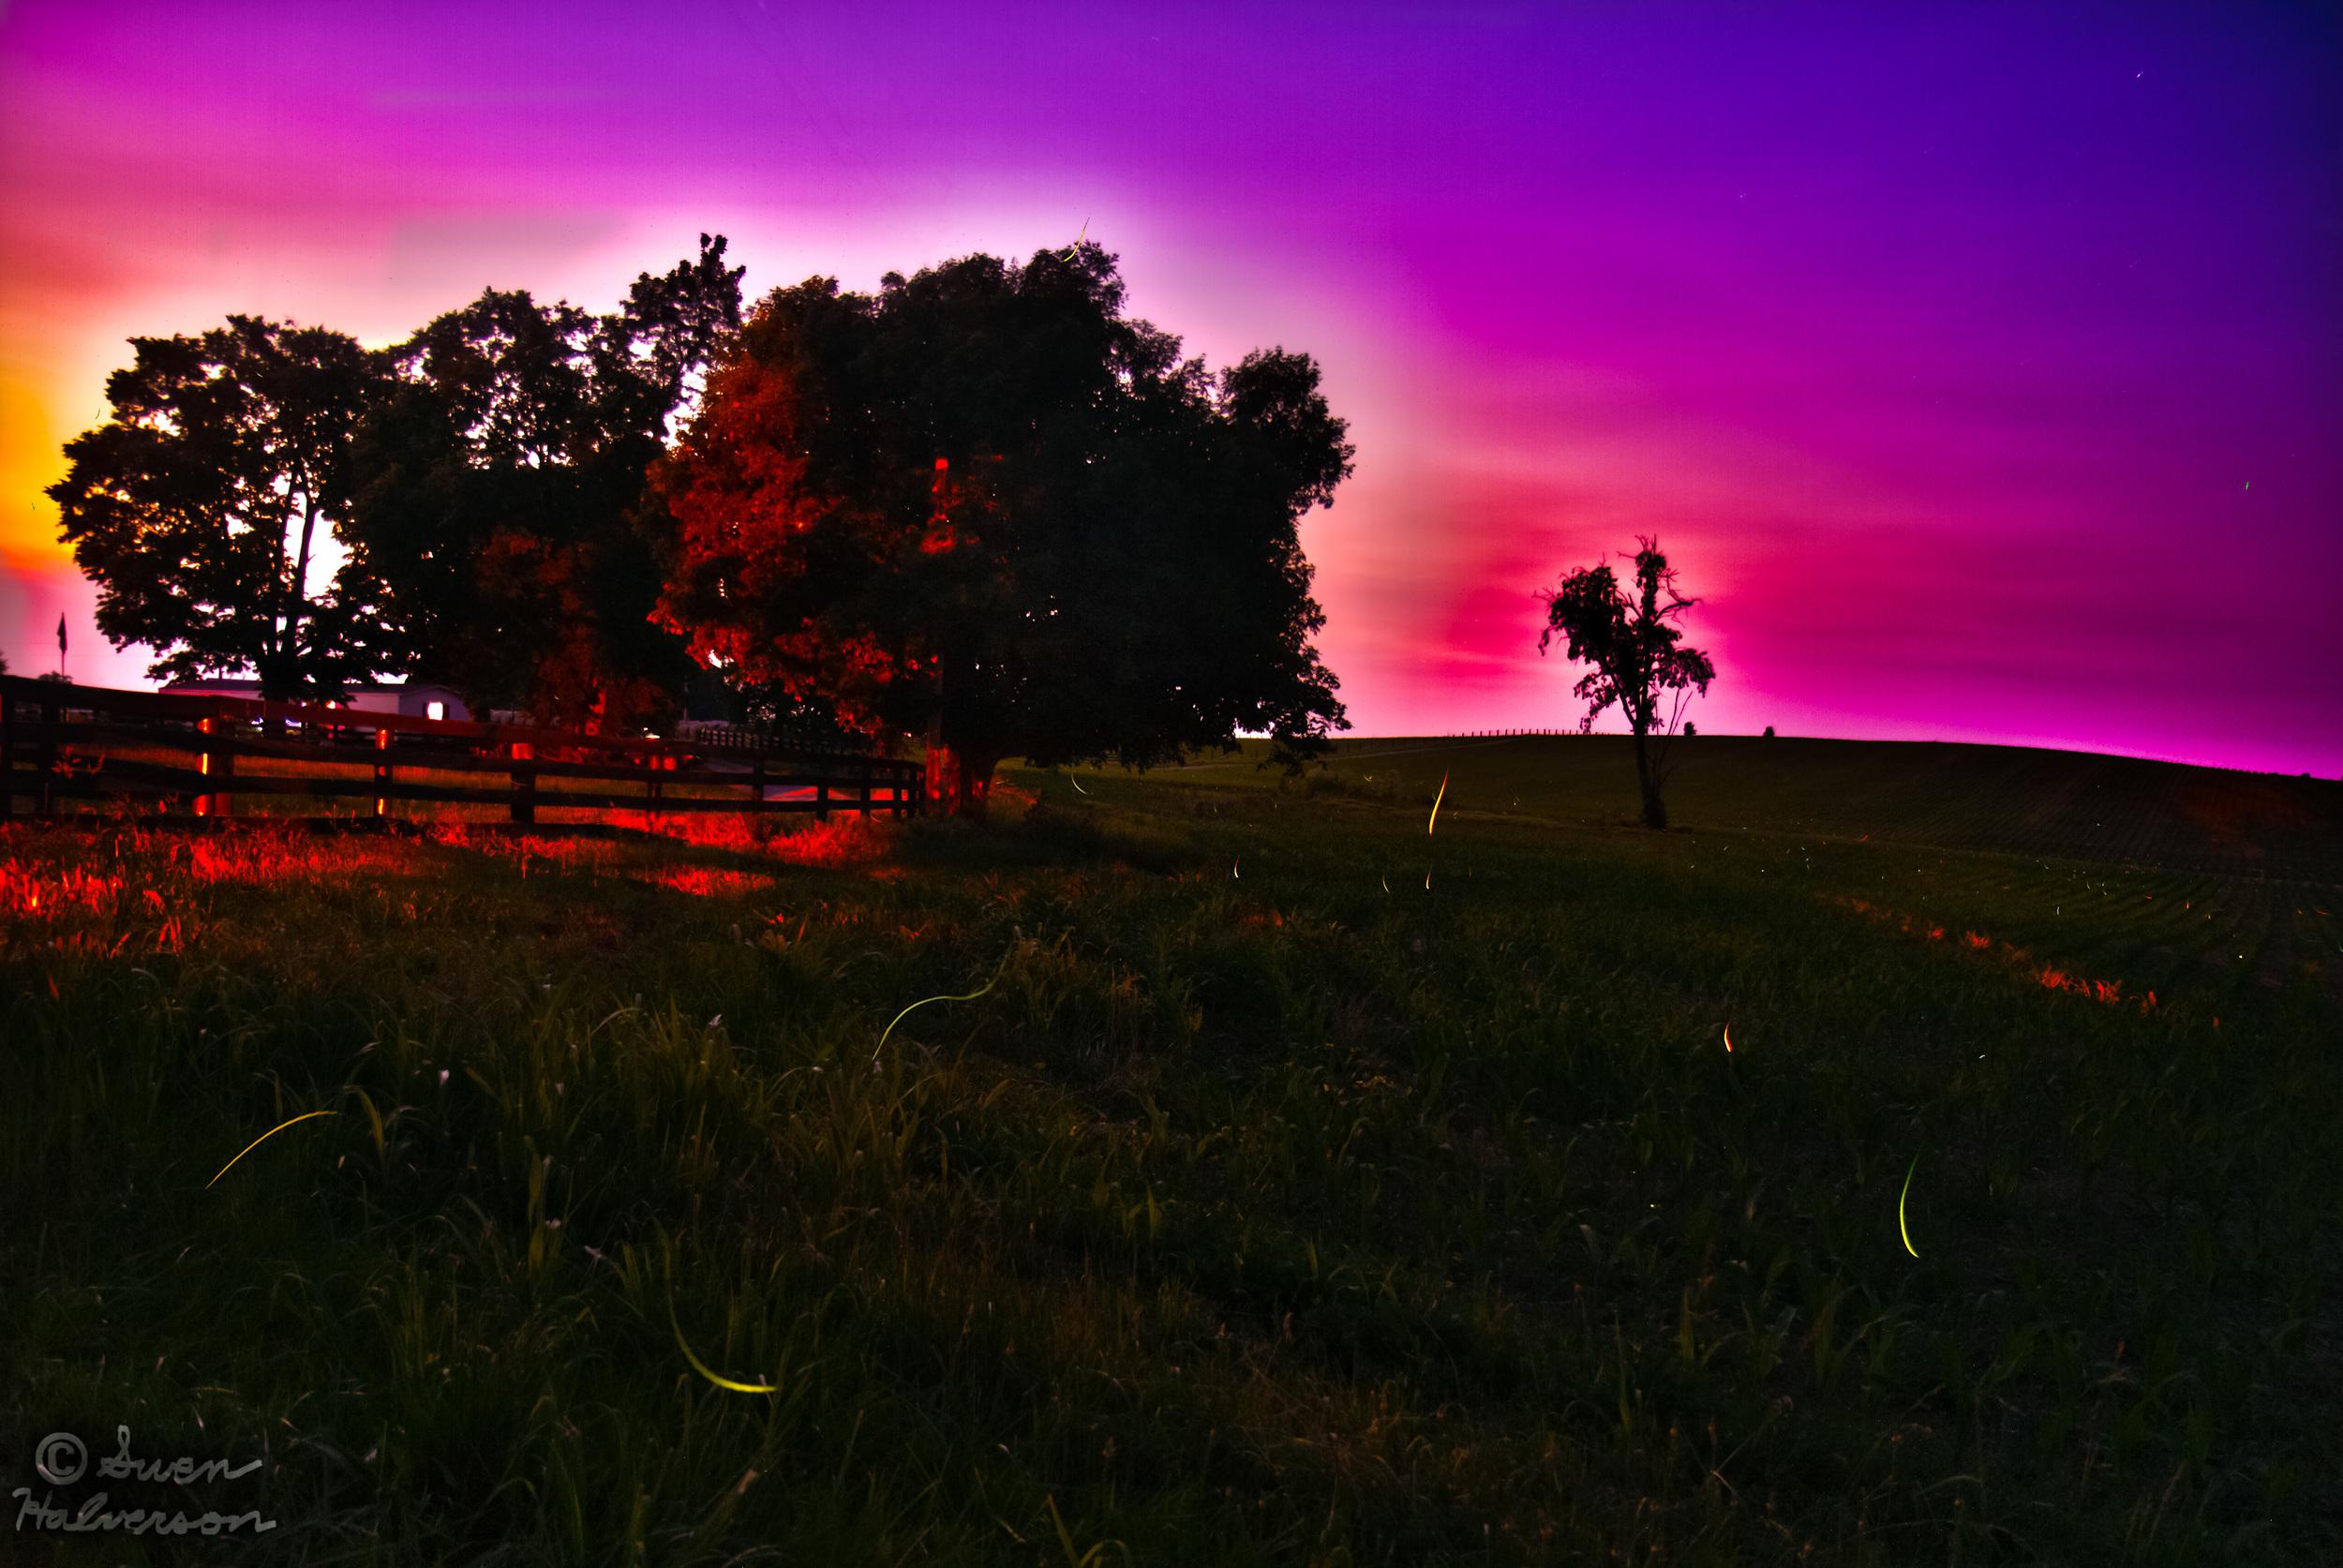 Theme: Dusk <br>Title: Fireflies